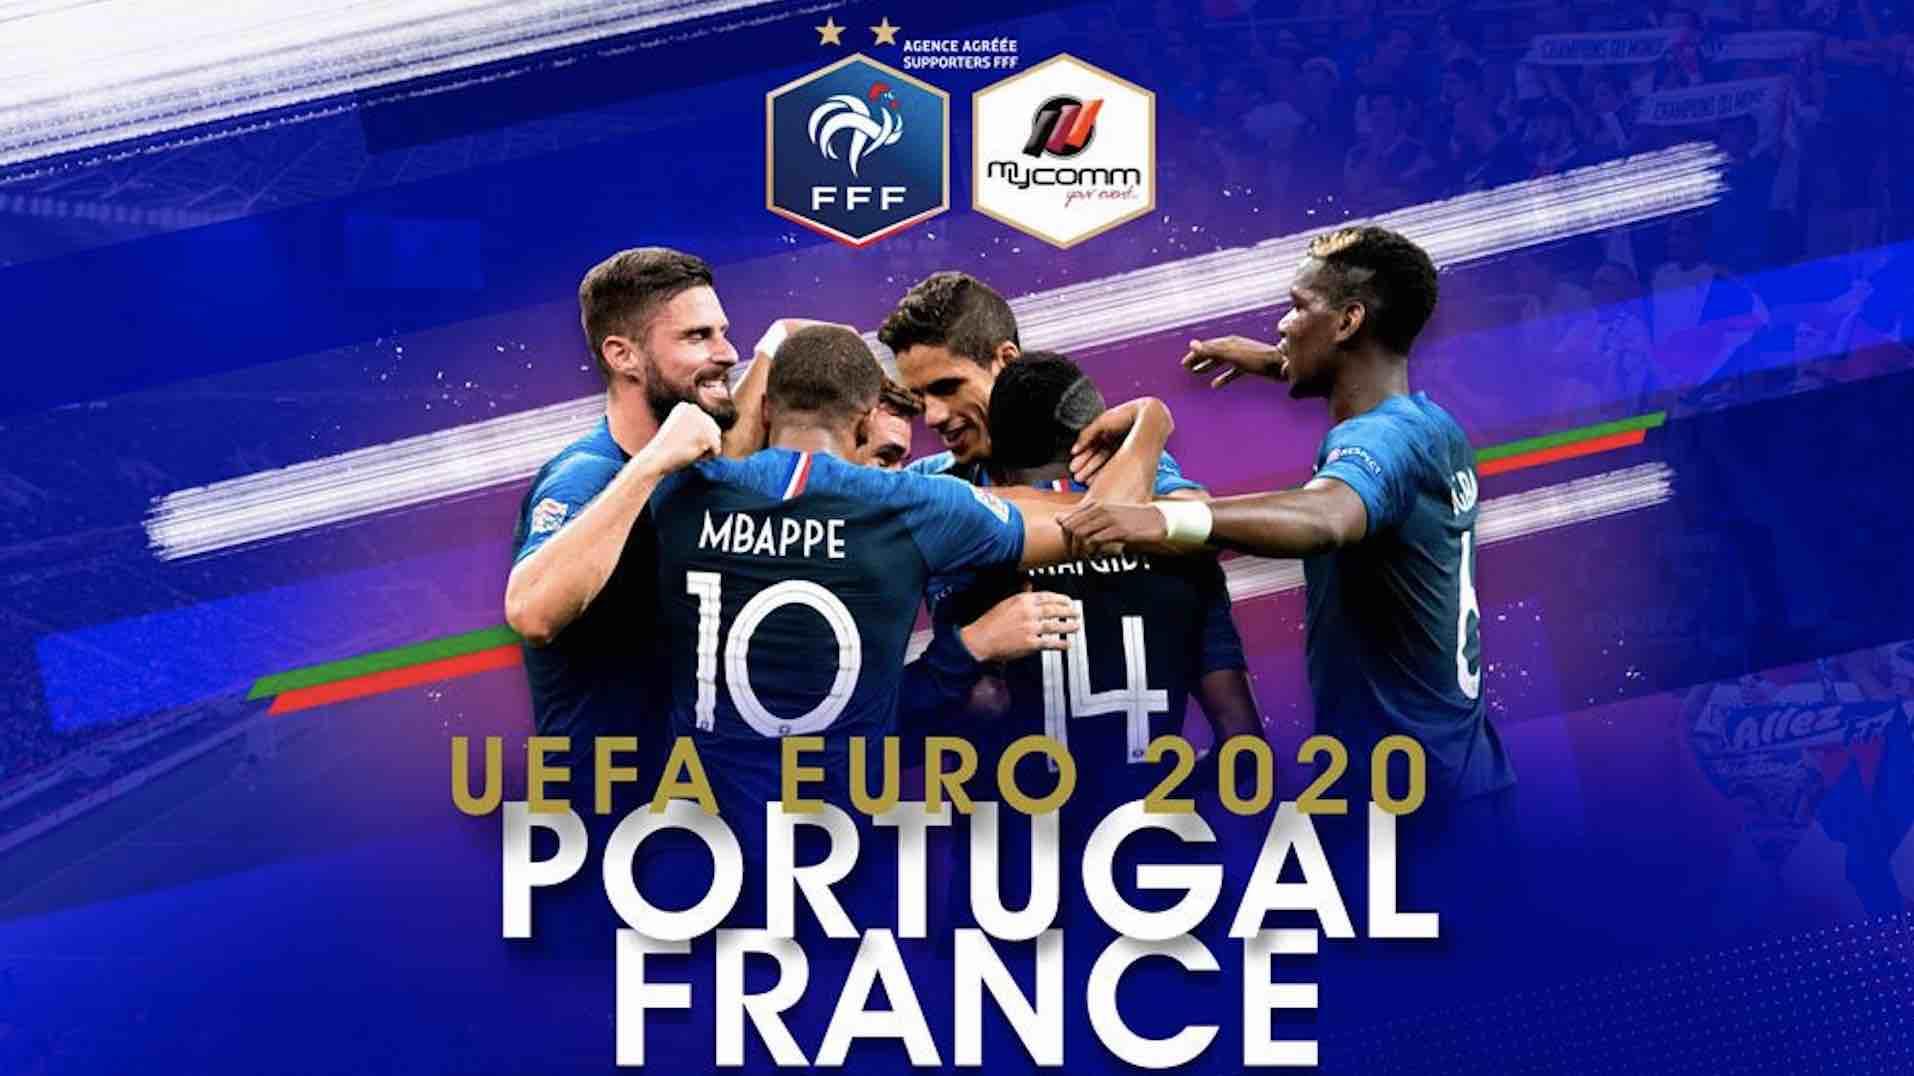 Portugal France - Euro 2020 - TF1 -